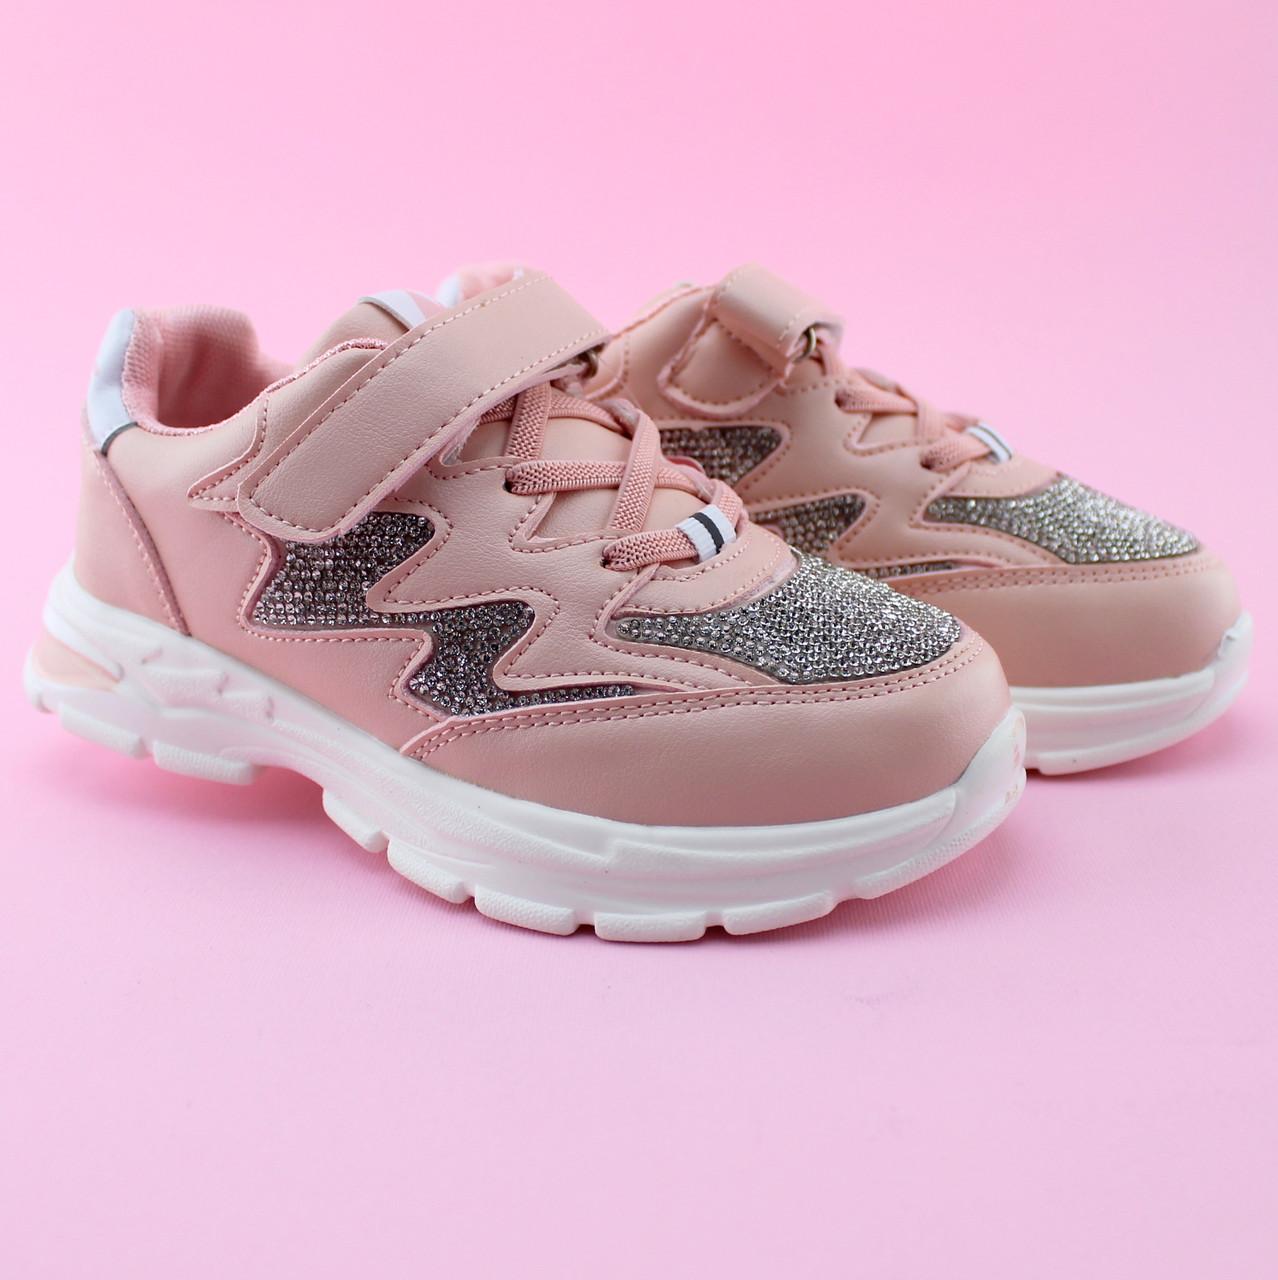 f57c81d9 Детские кроссовки типу skechers девочке пудра стразы Томм размер 31,32,33,34